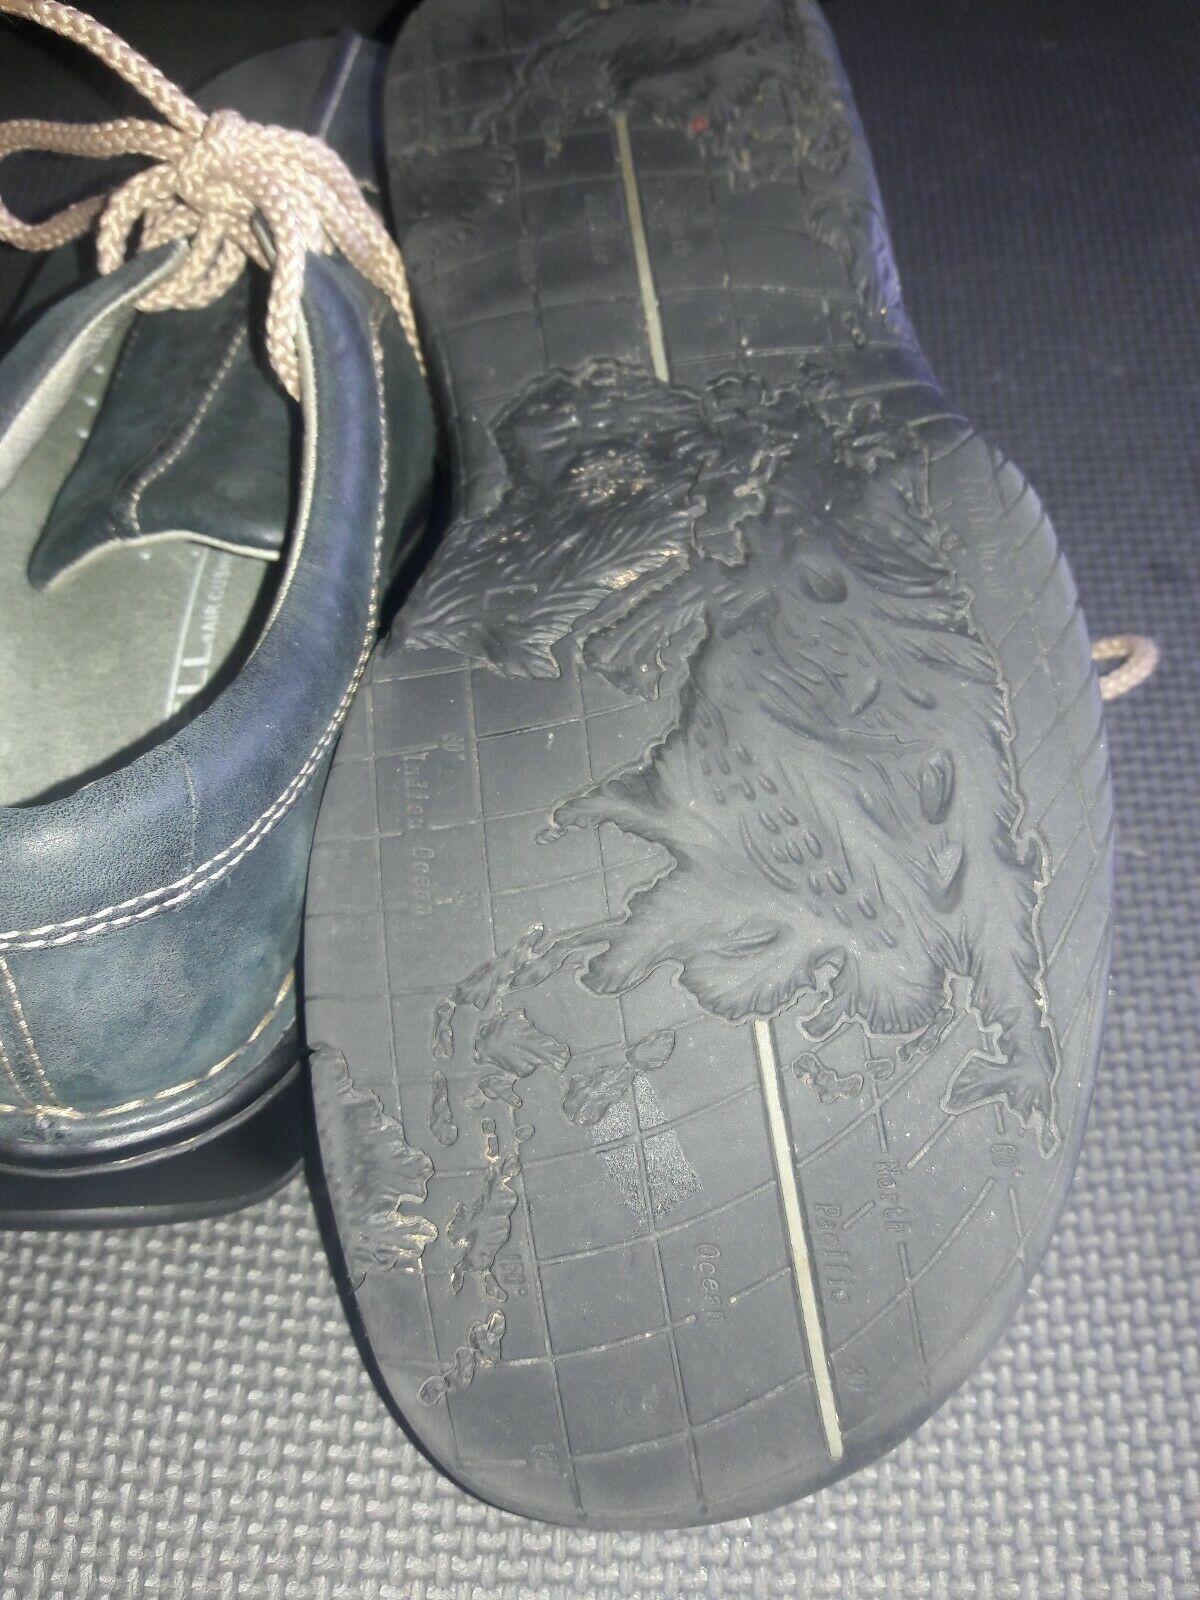 Merrell World Summit Black Leather - Men's Size 7